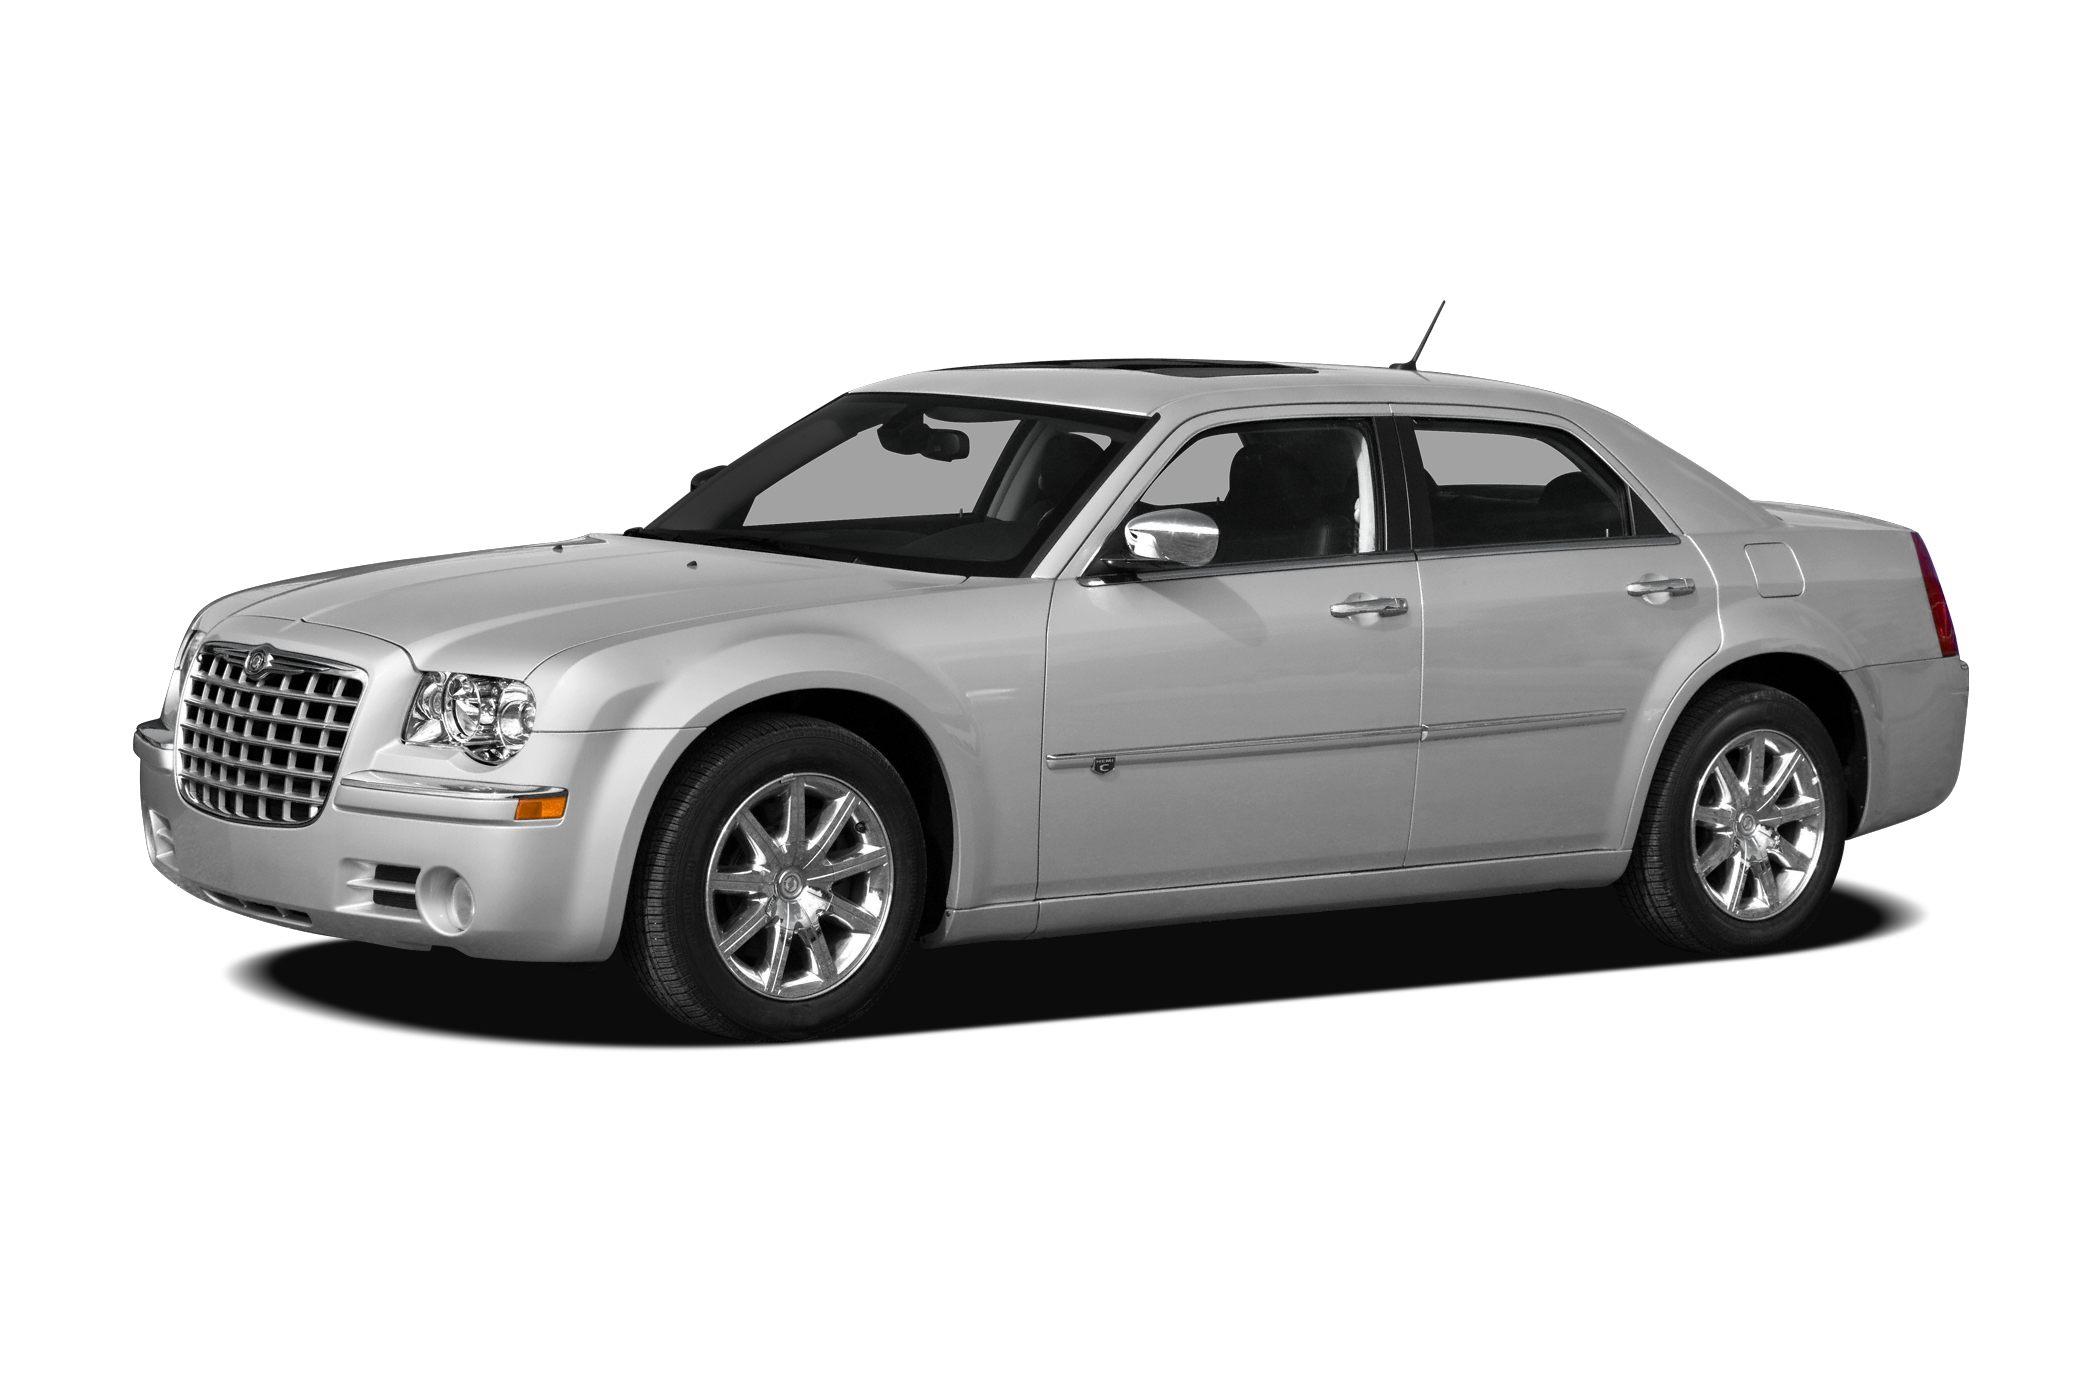 2010 Chrysler 300C Hemi Sedan for sale in Bakersfield for $20,999 with 54,229 miles